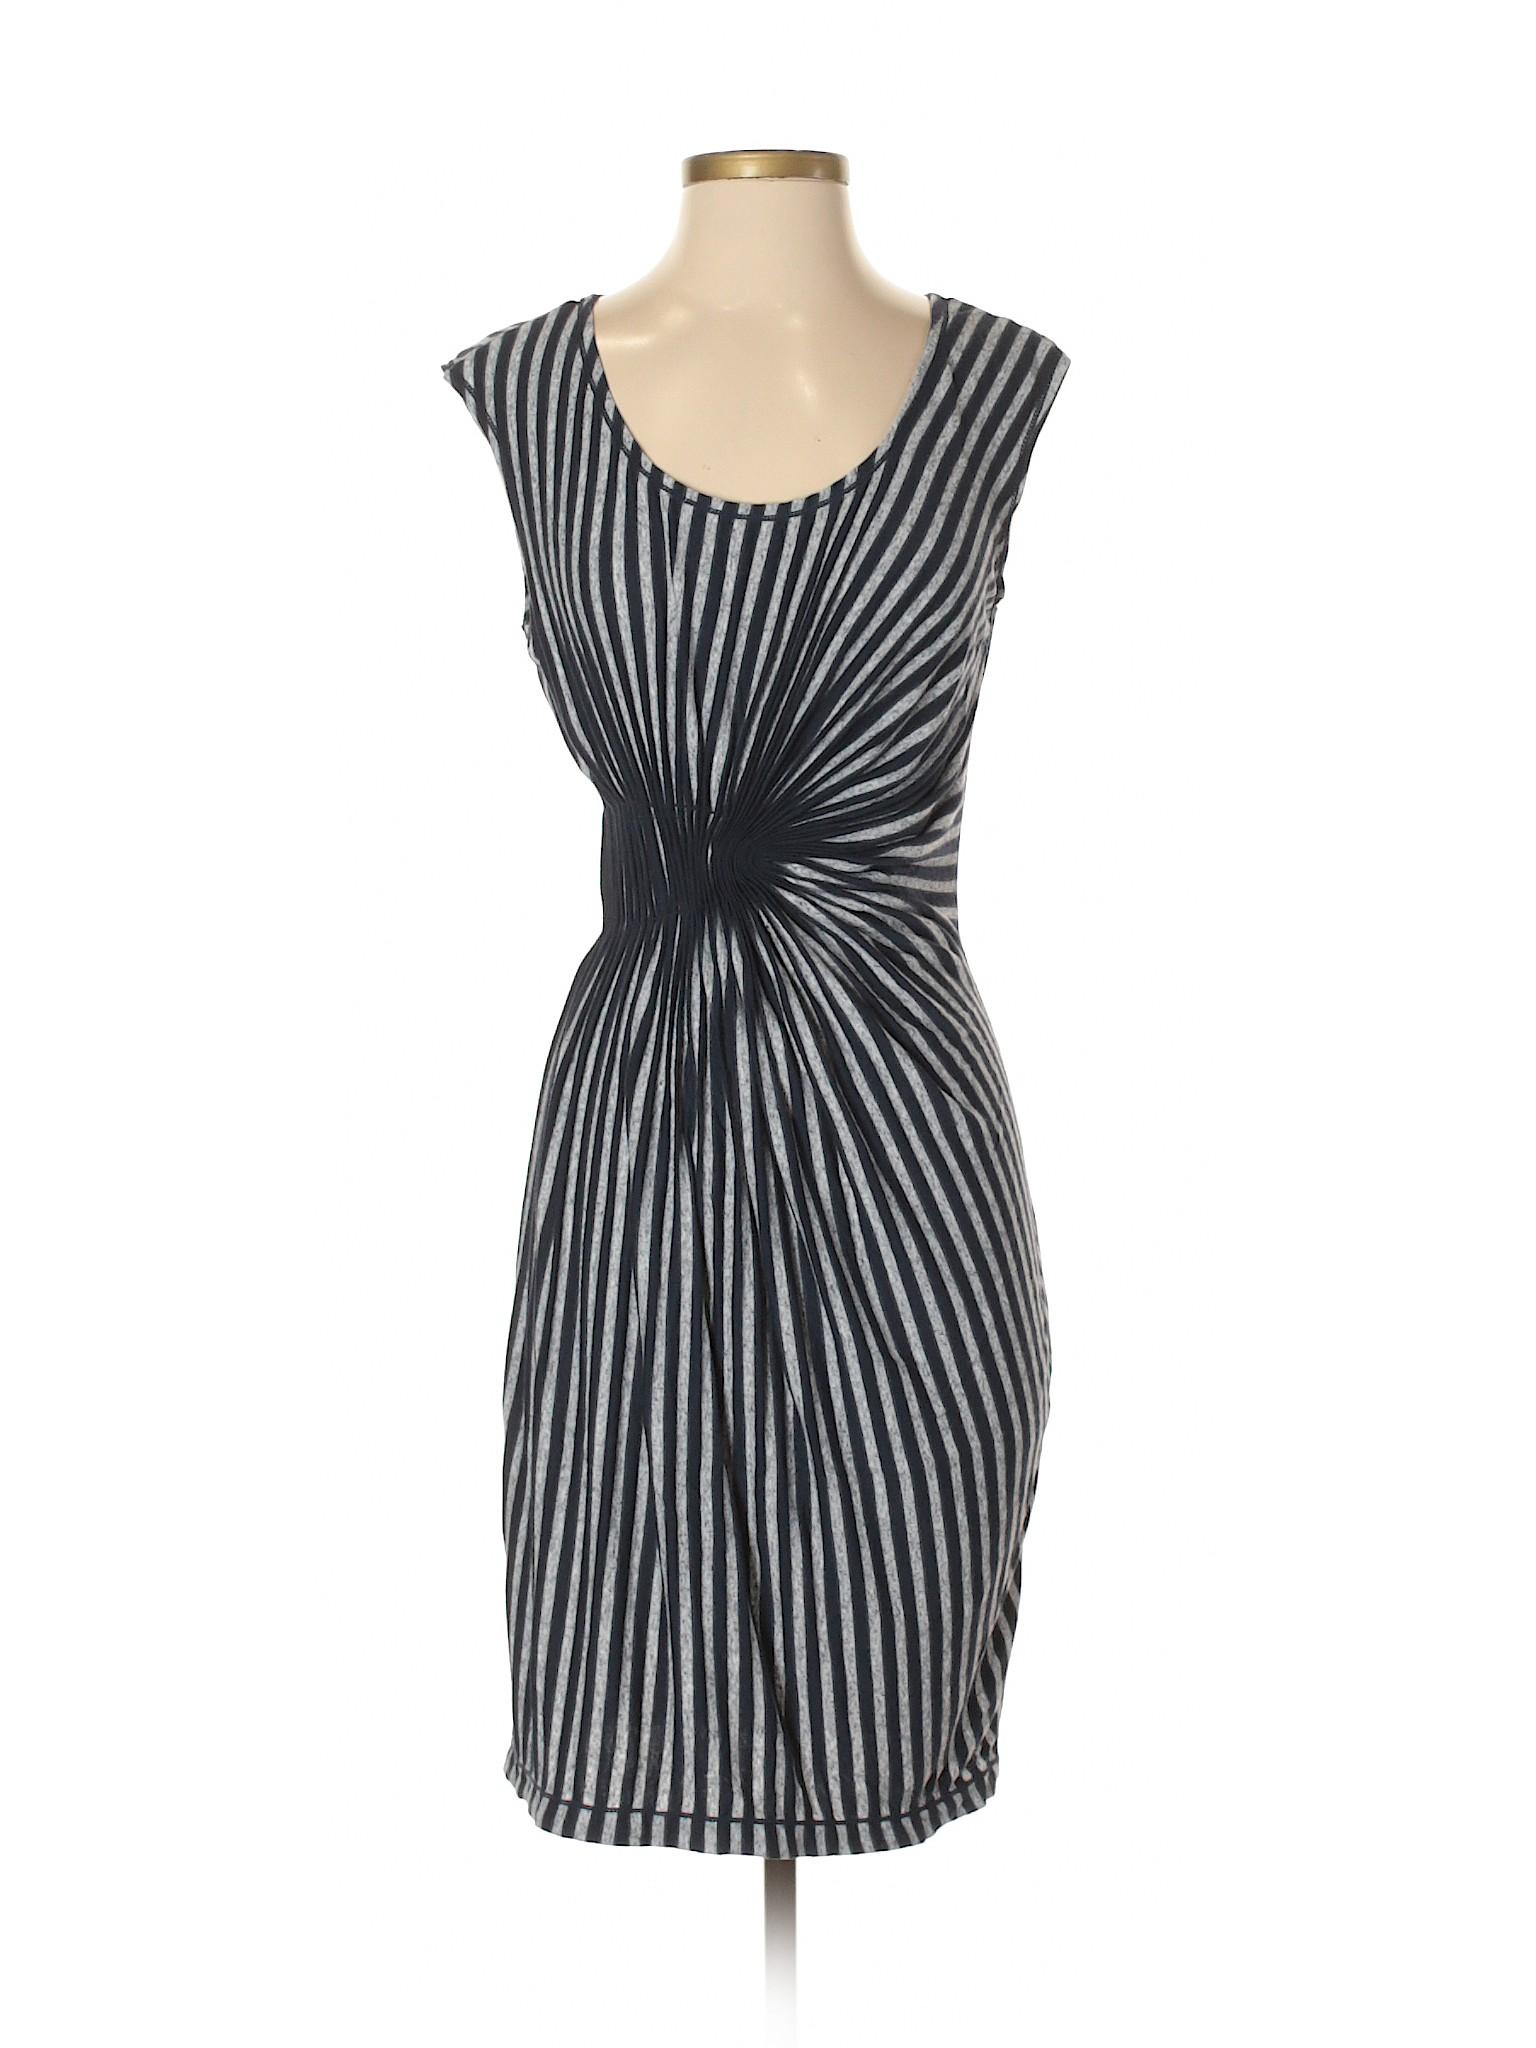 Casual Studio winter M Dress Boutique 7n1wXHqq